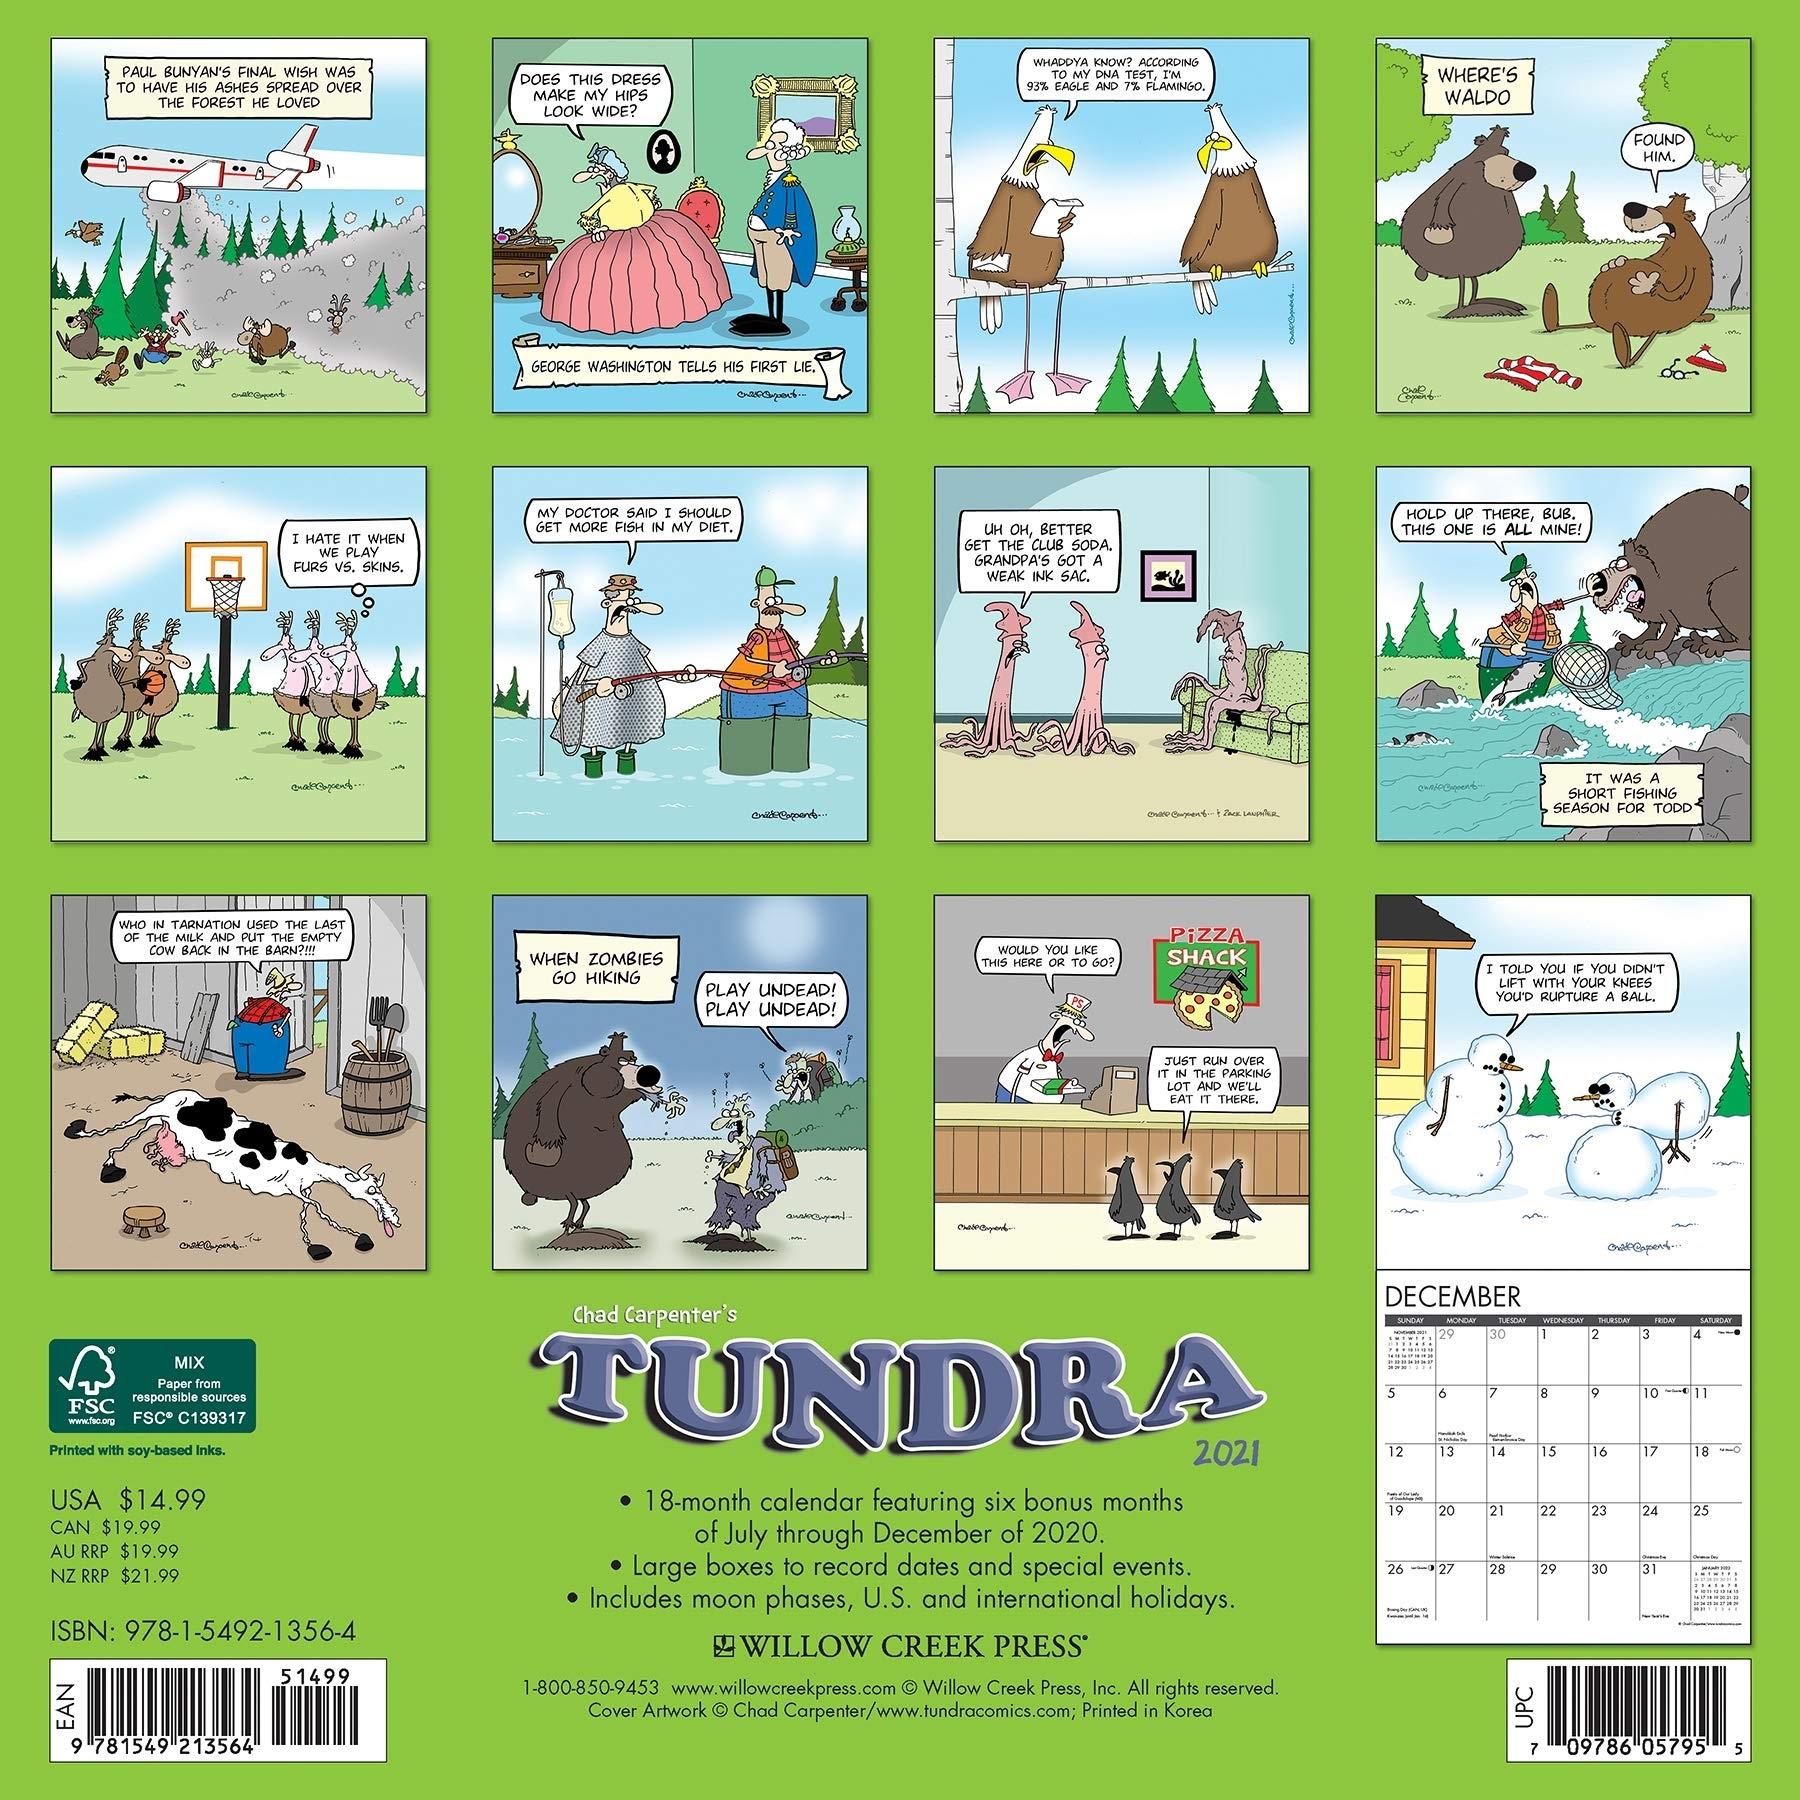 2021 Tundra Wall Calendar   Tundra Comics